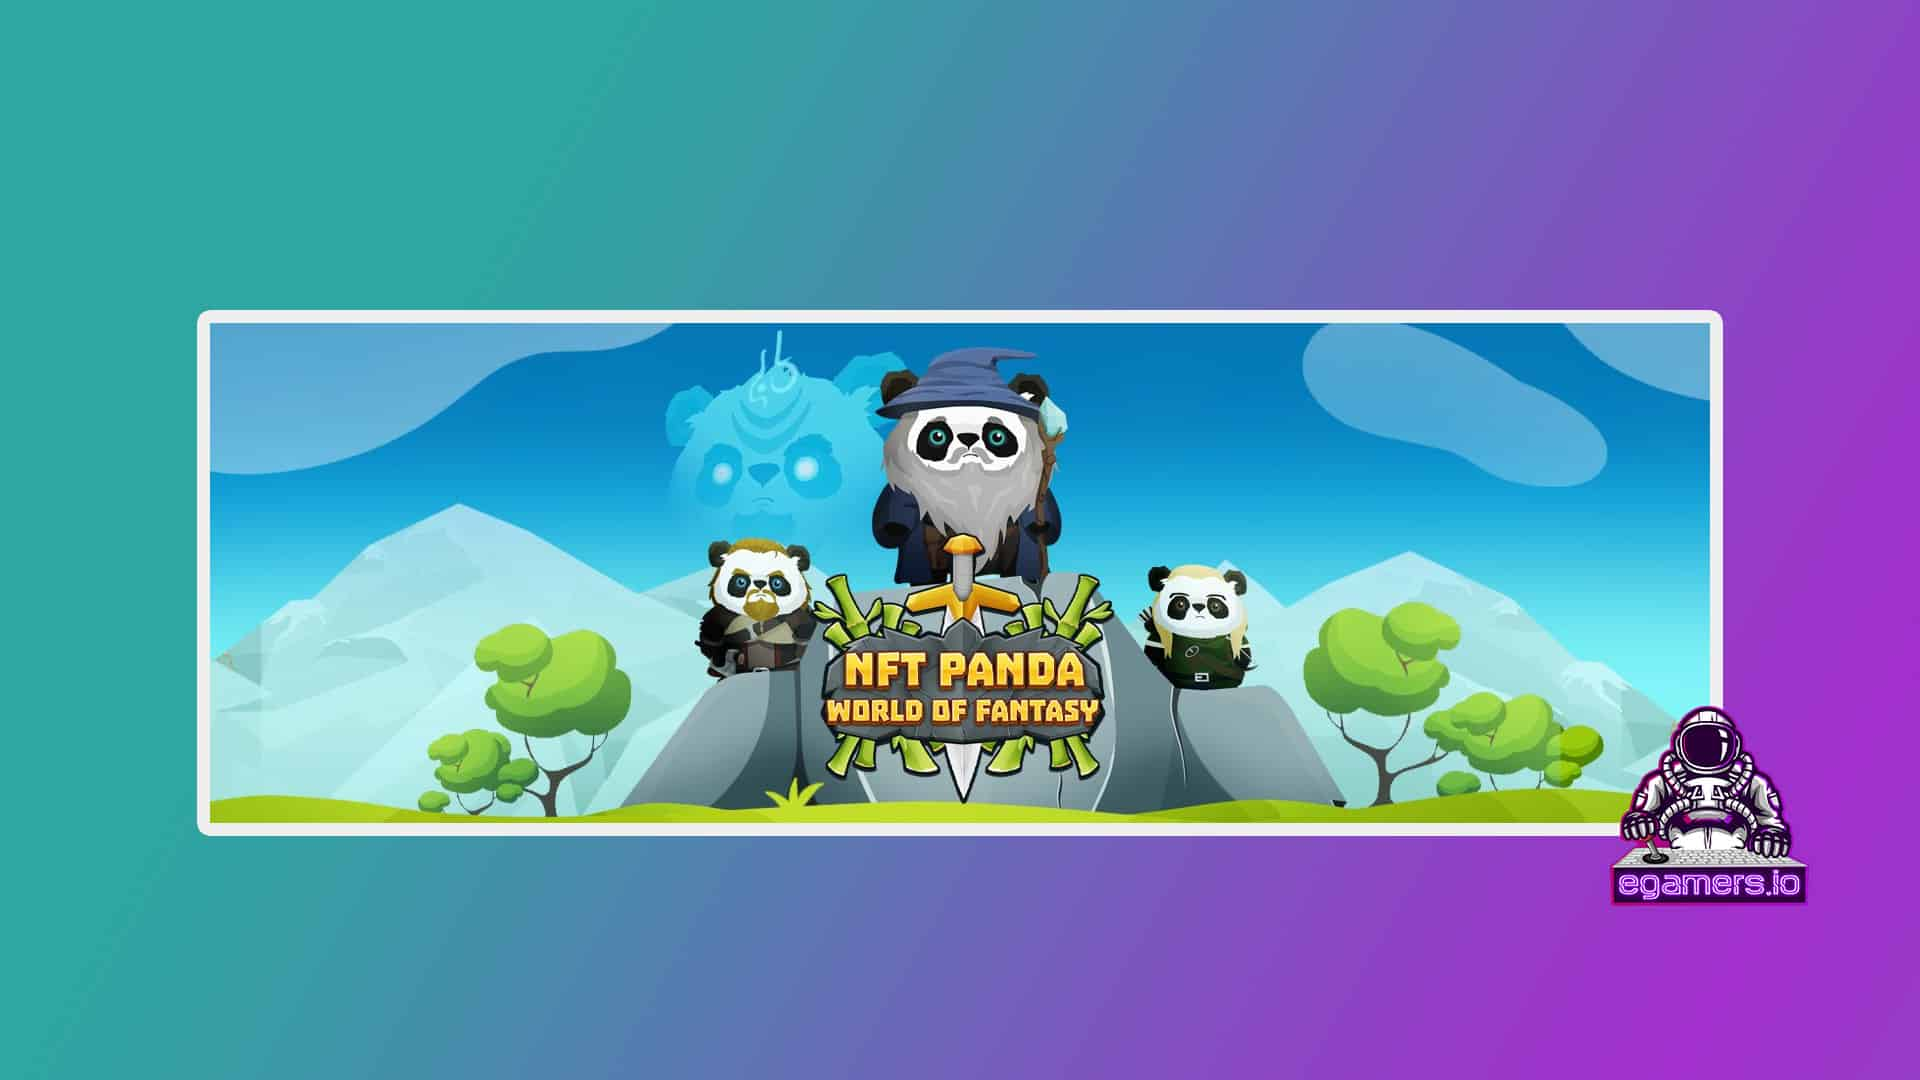 NFT Panda play to earn